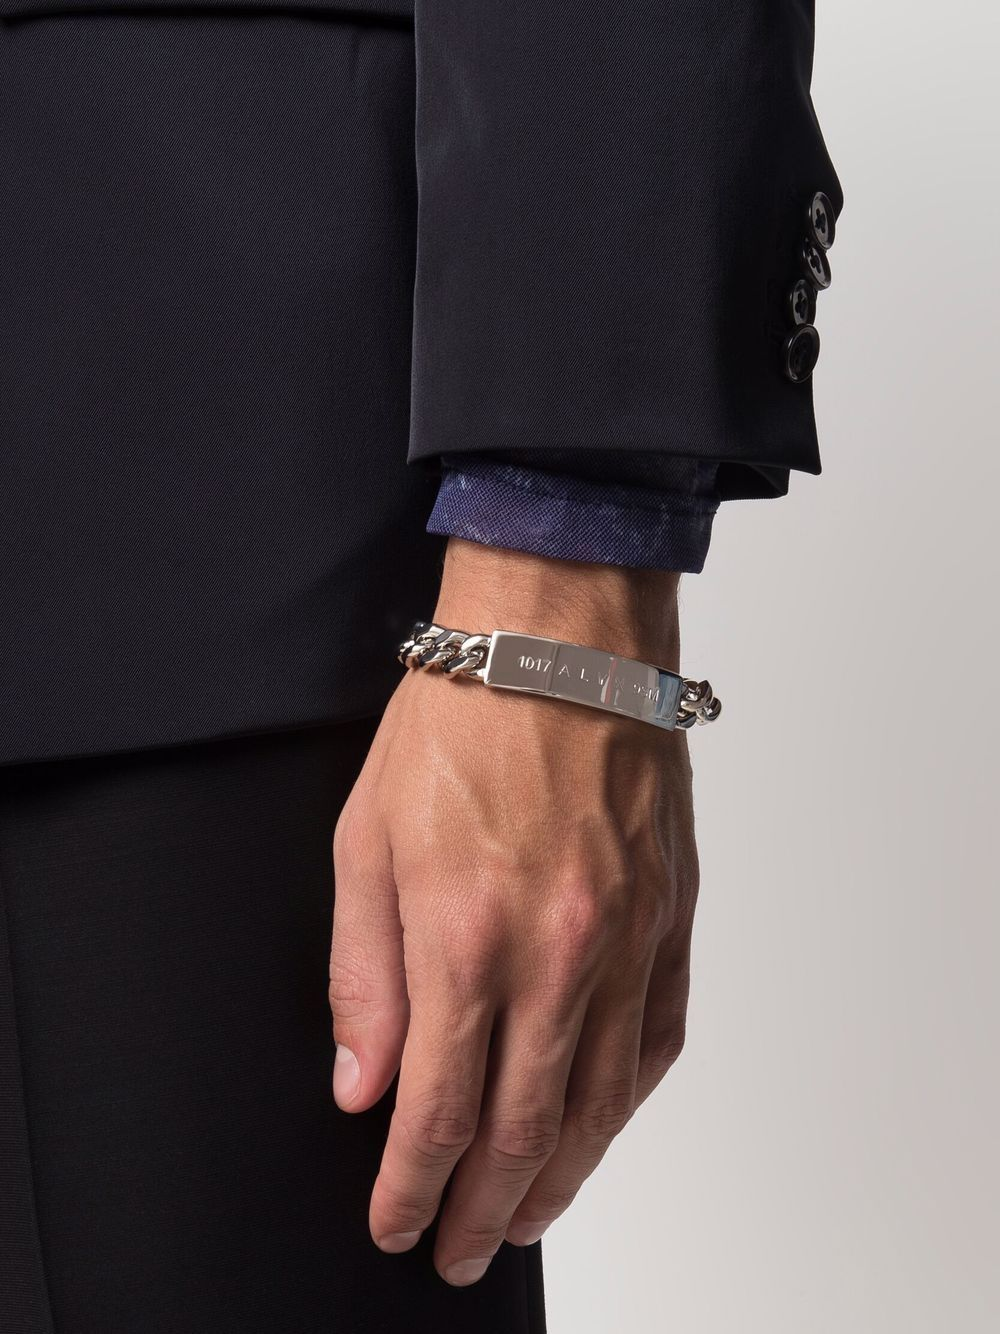 logo bracelet man silver 1017 ALYX 9SM   Jewellery   AAUJW0119OT01GRY0002